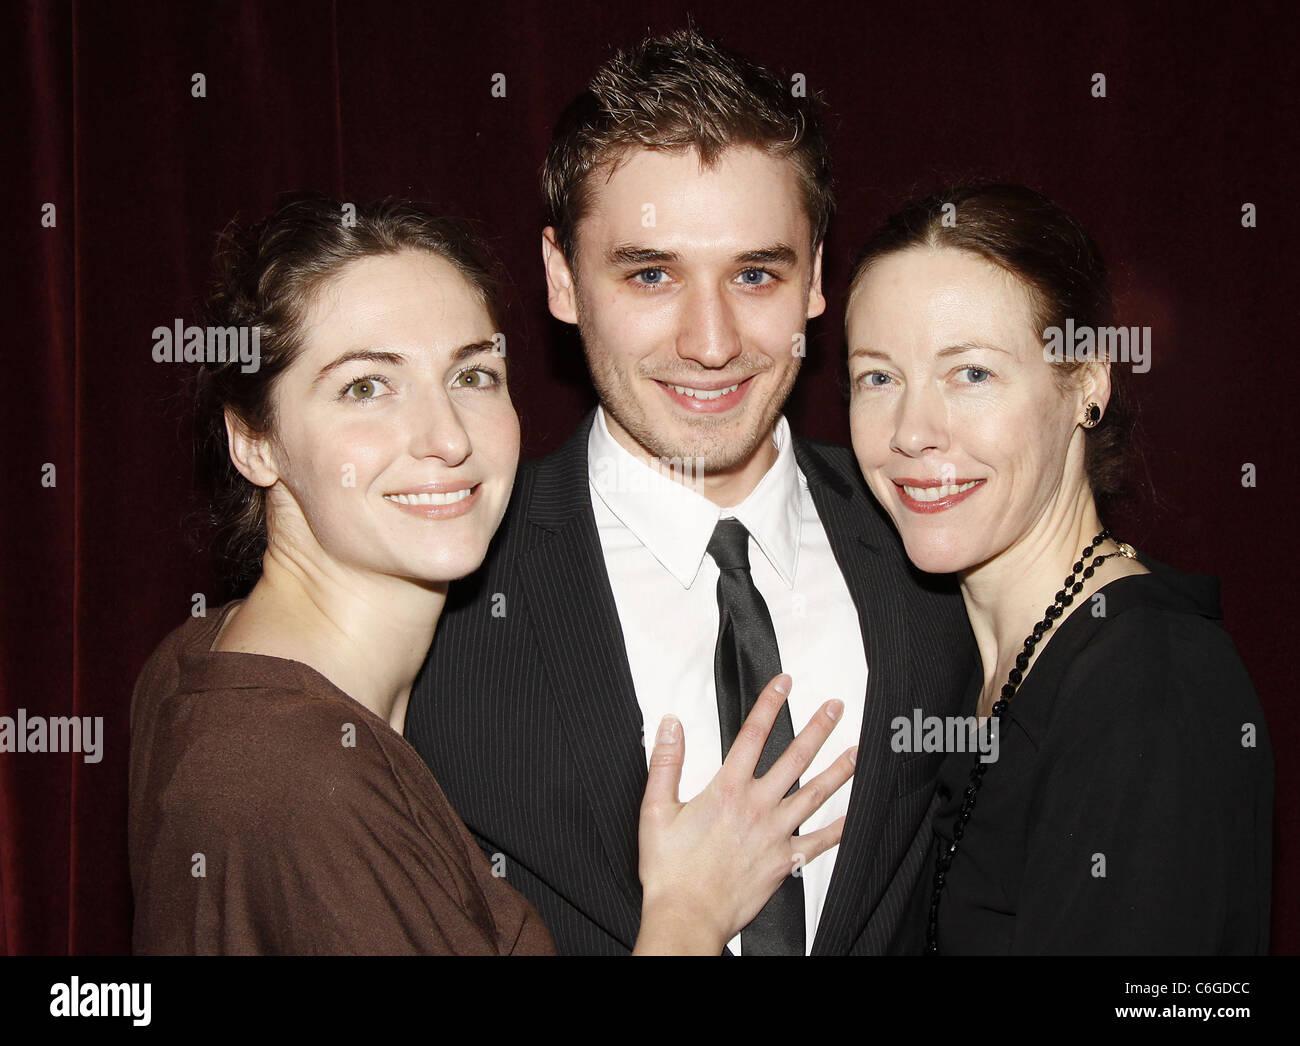 Liz Stauber,Jackie Rice (b. 1990) Hot picture Kathie Lee Gifford,Sarah Shahi